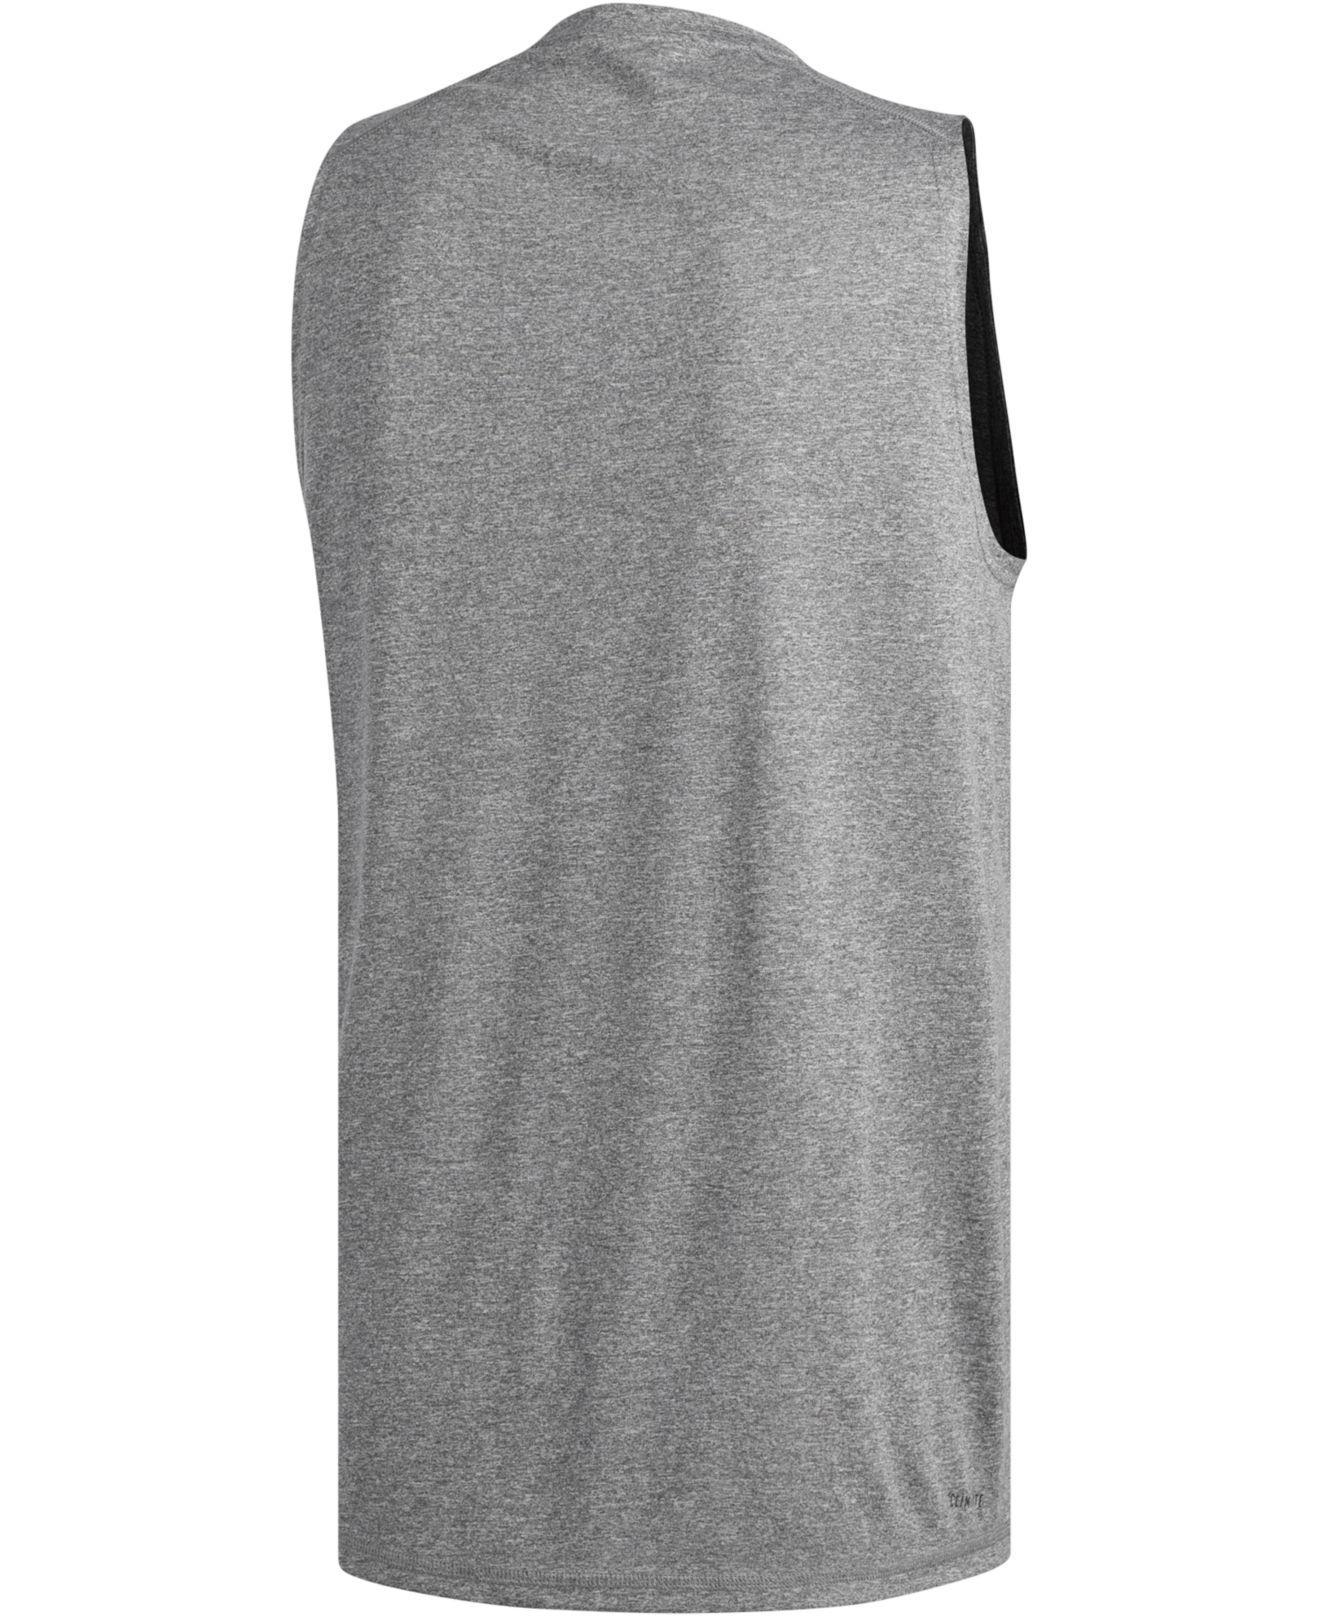 34c56df8b5d9a Lyst - adidas Freelift Tank Top in Gray for Men